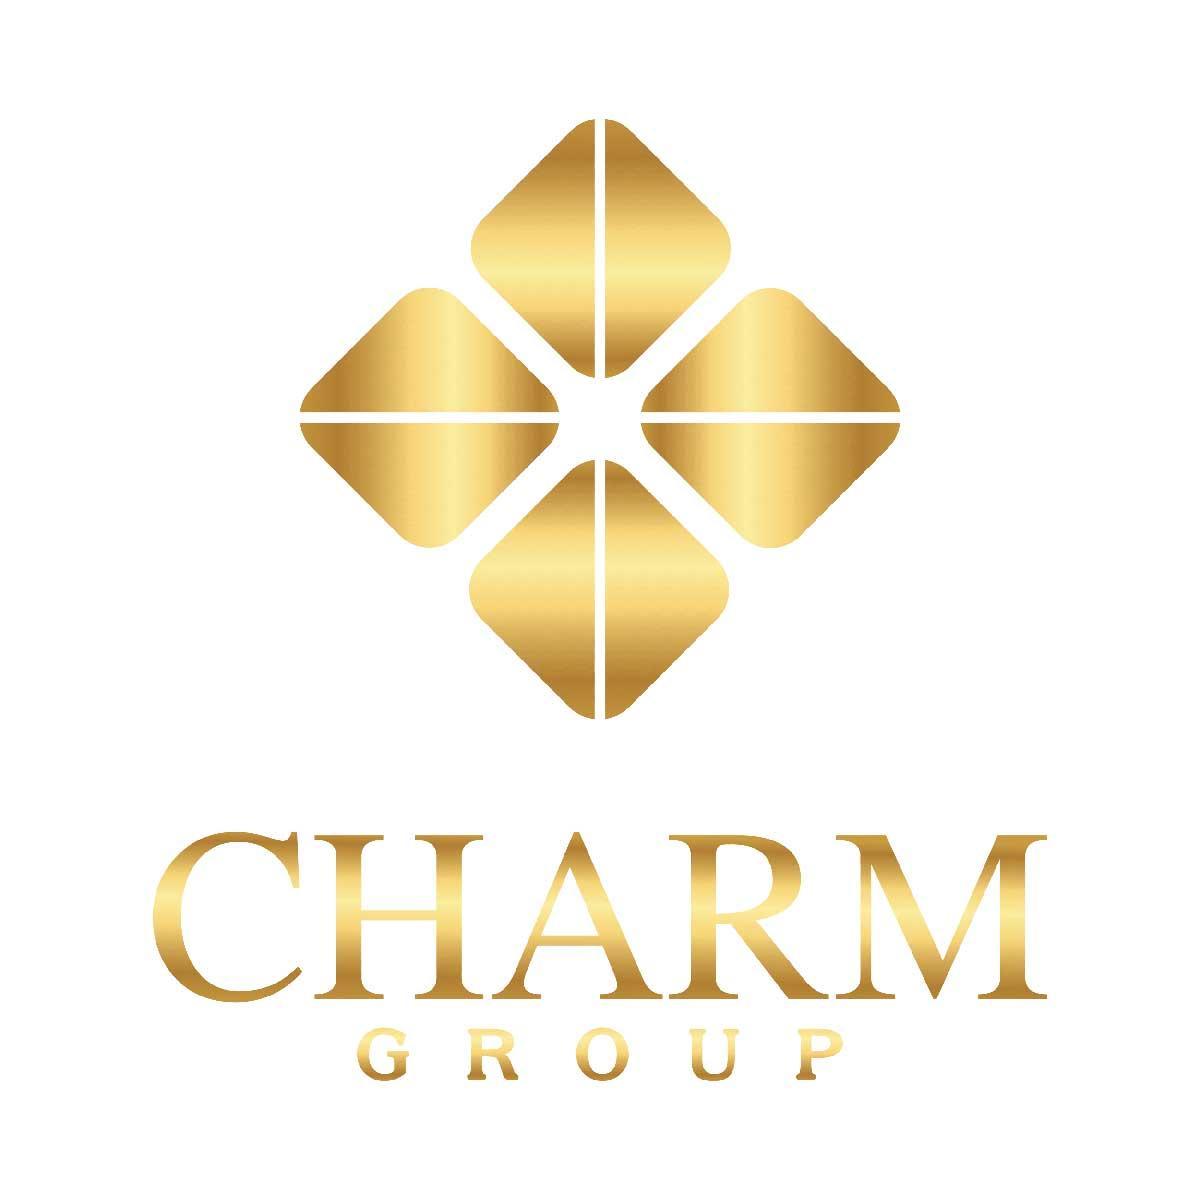 logo charm group - CHARM GROUP